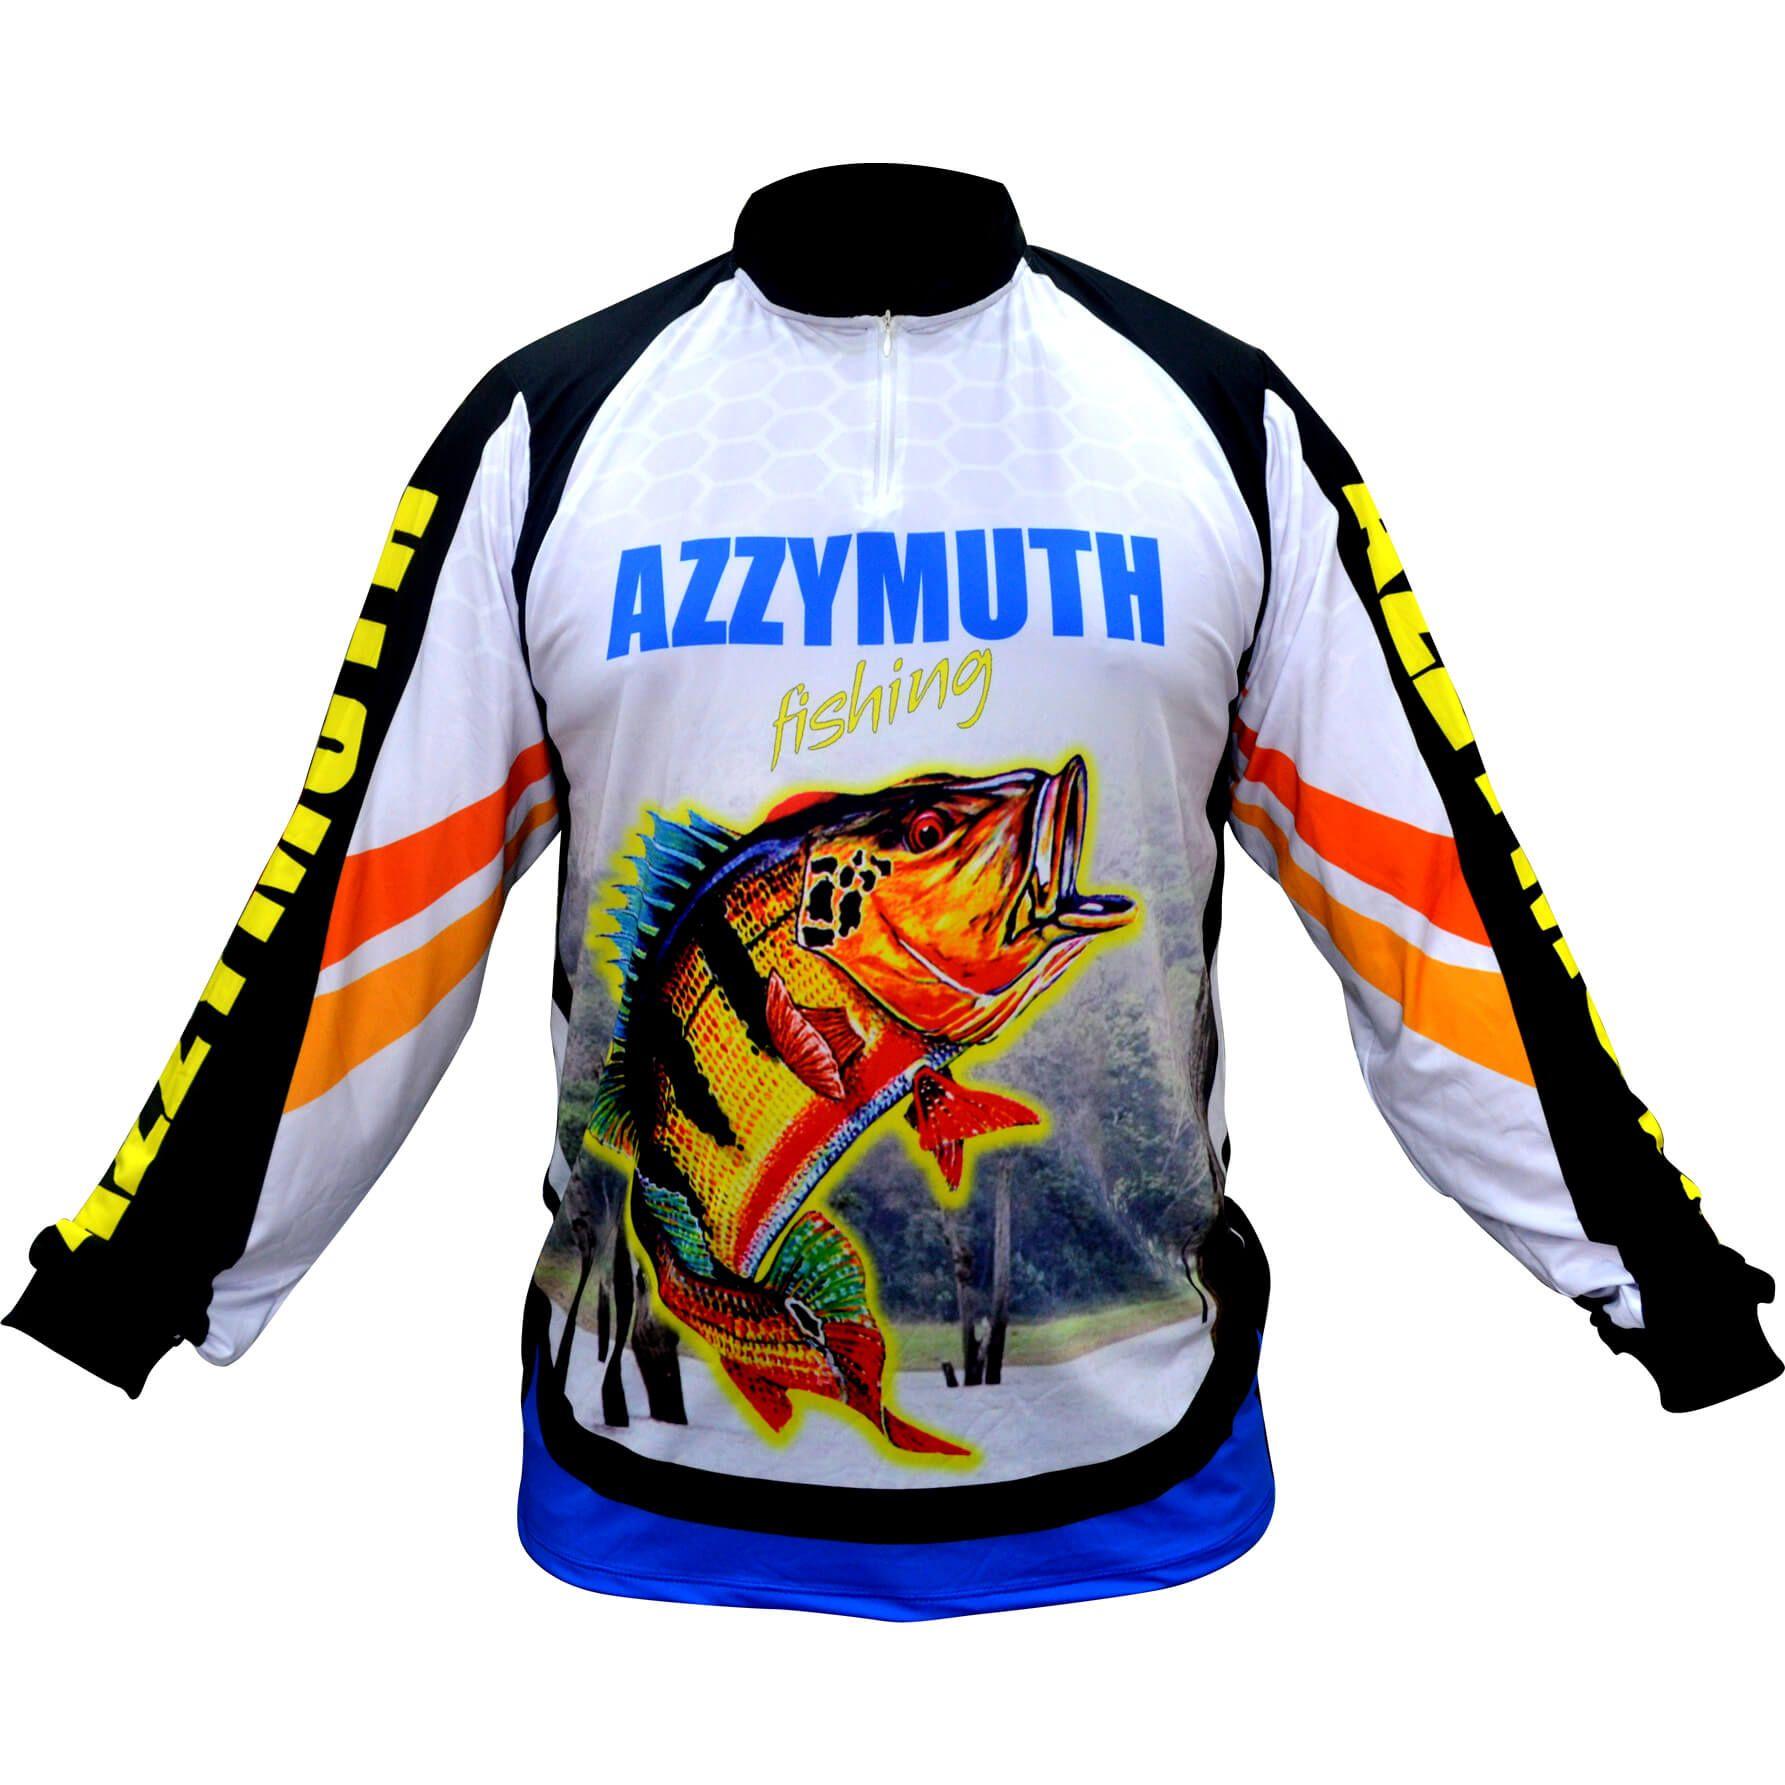 Camiseta De Pesca Dry Fit Uv Azzymuth